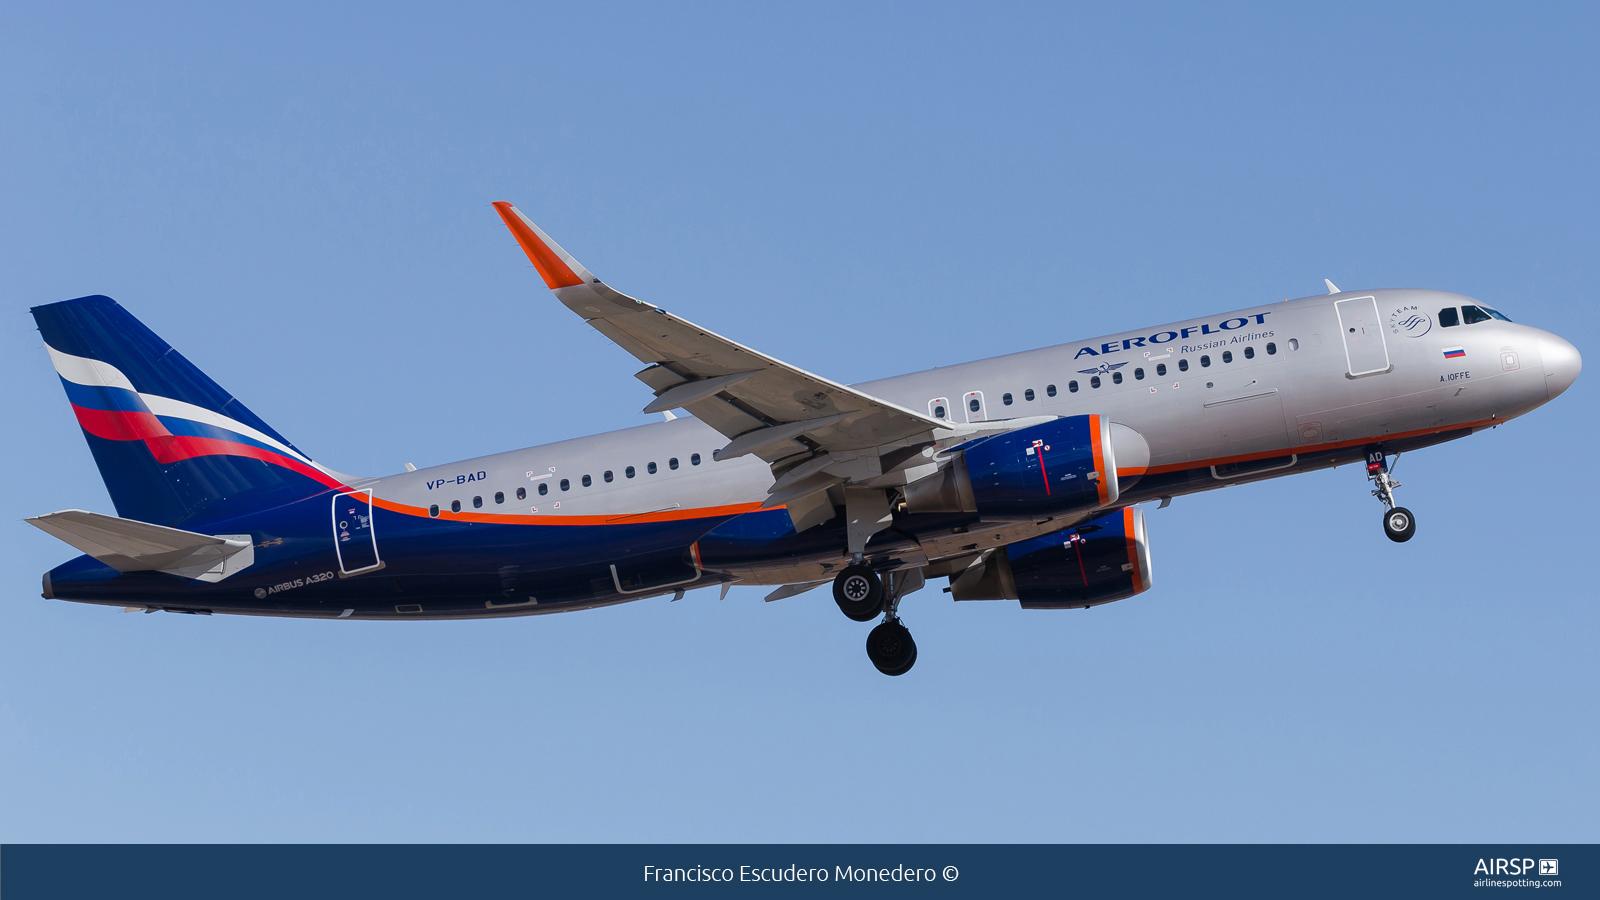 Aeroflot  Airbus A320  VP-BAD